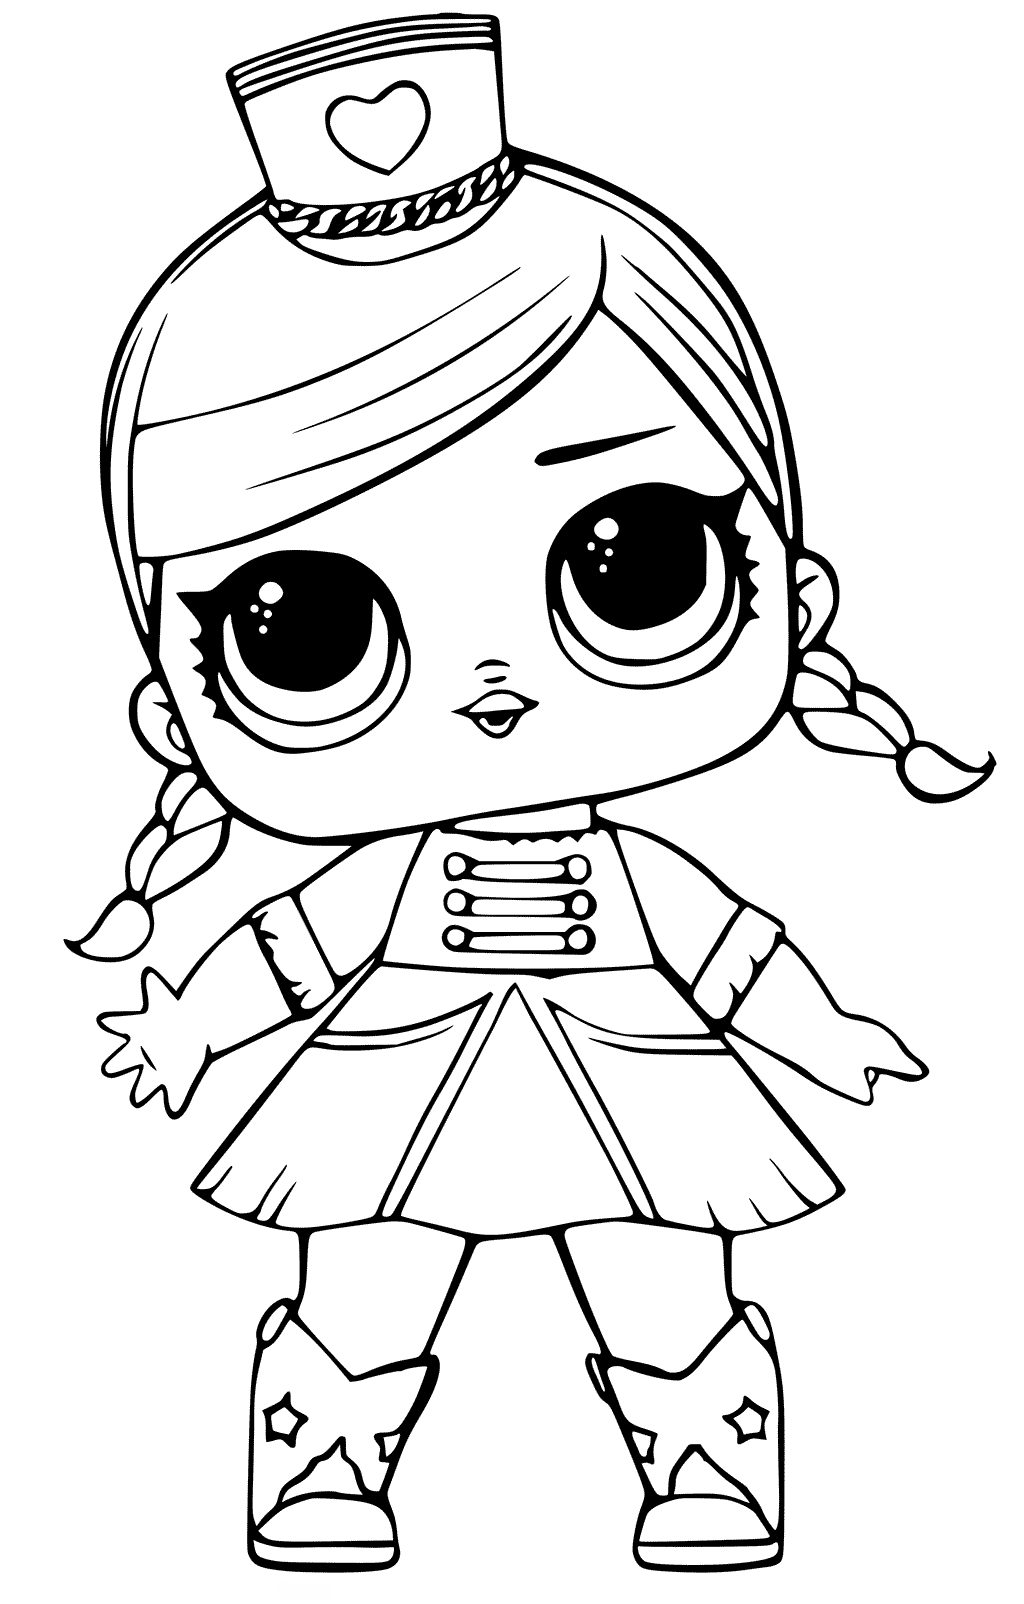 Кукла ЛОЛ леди оркестр - Куклы LOL | Раскраски, Детские ...